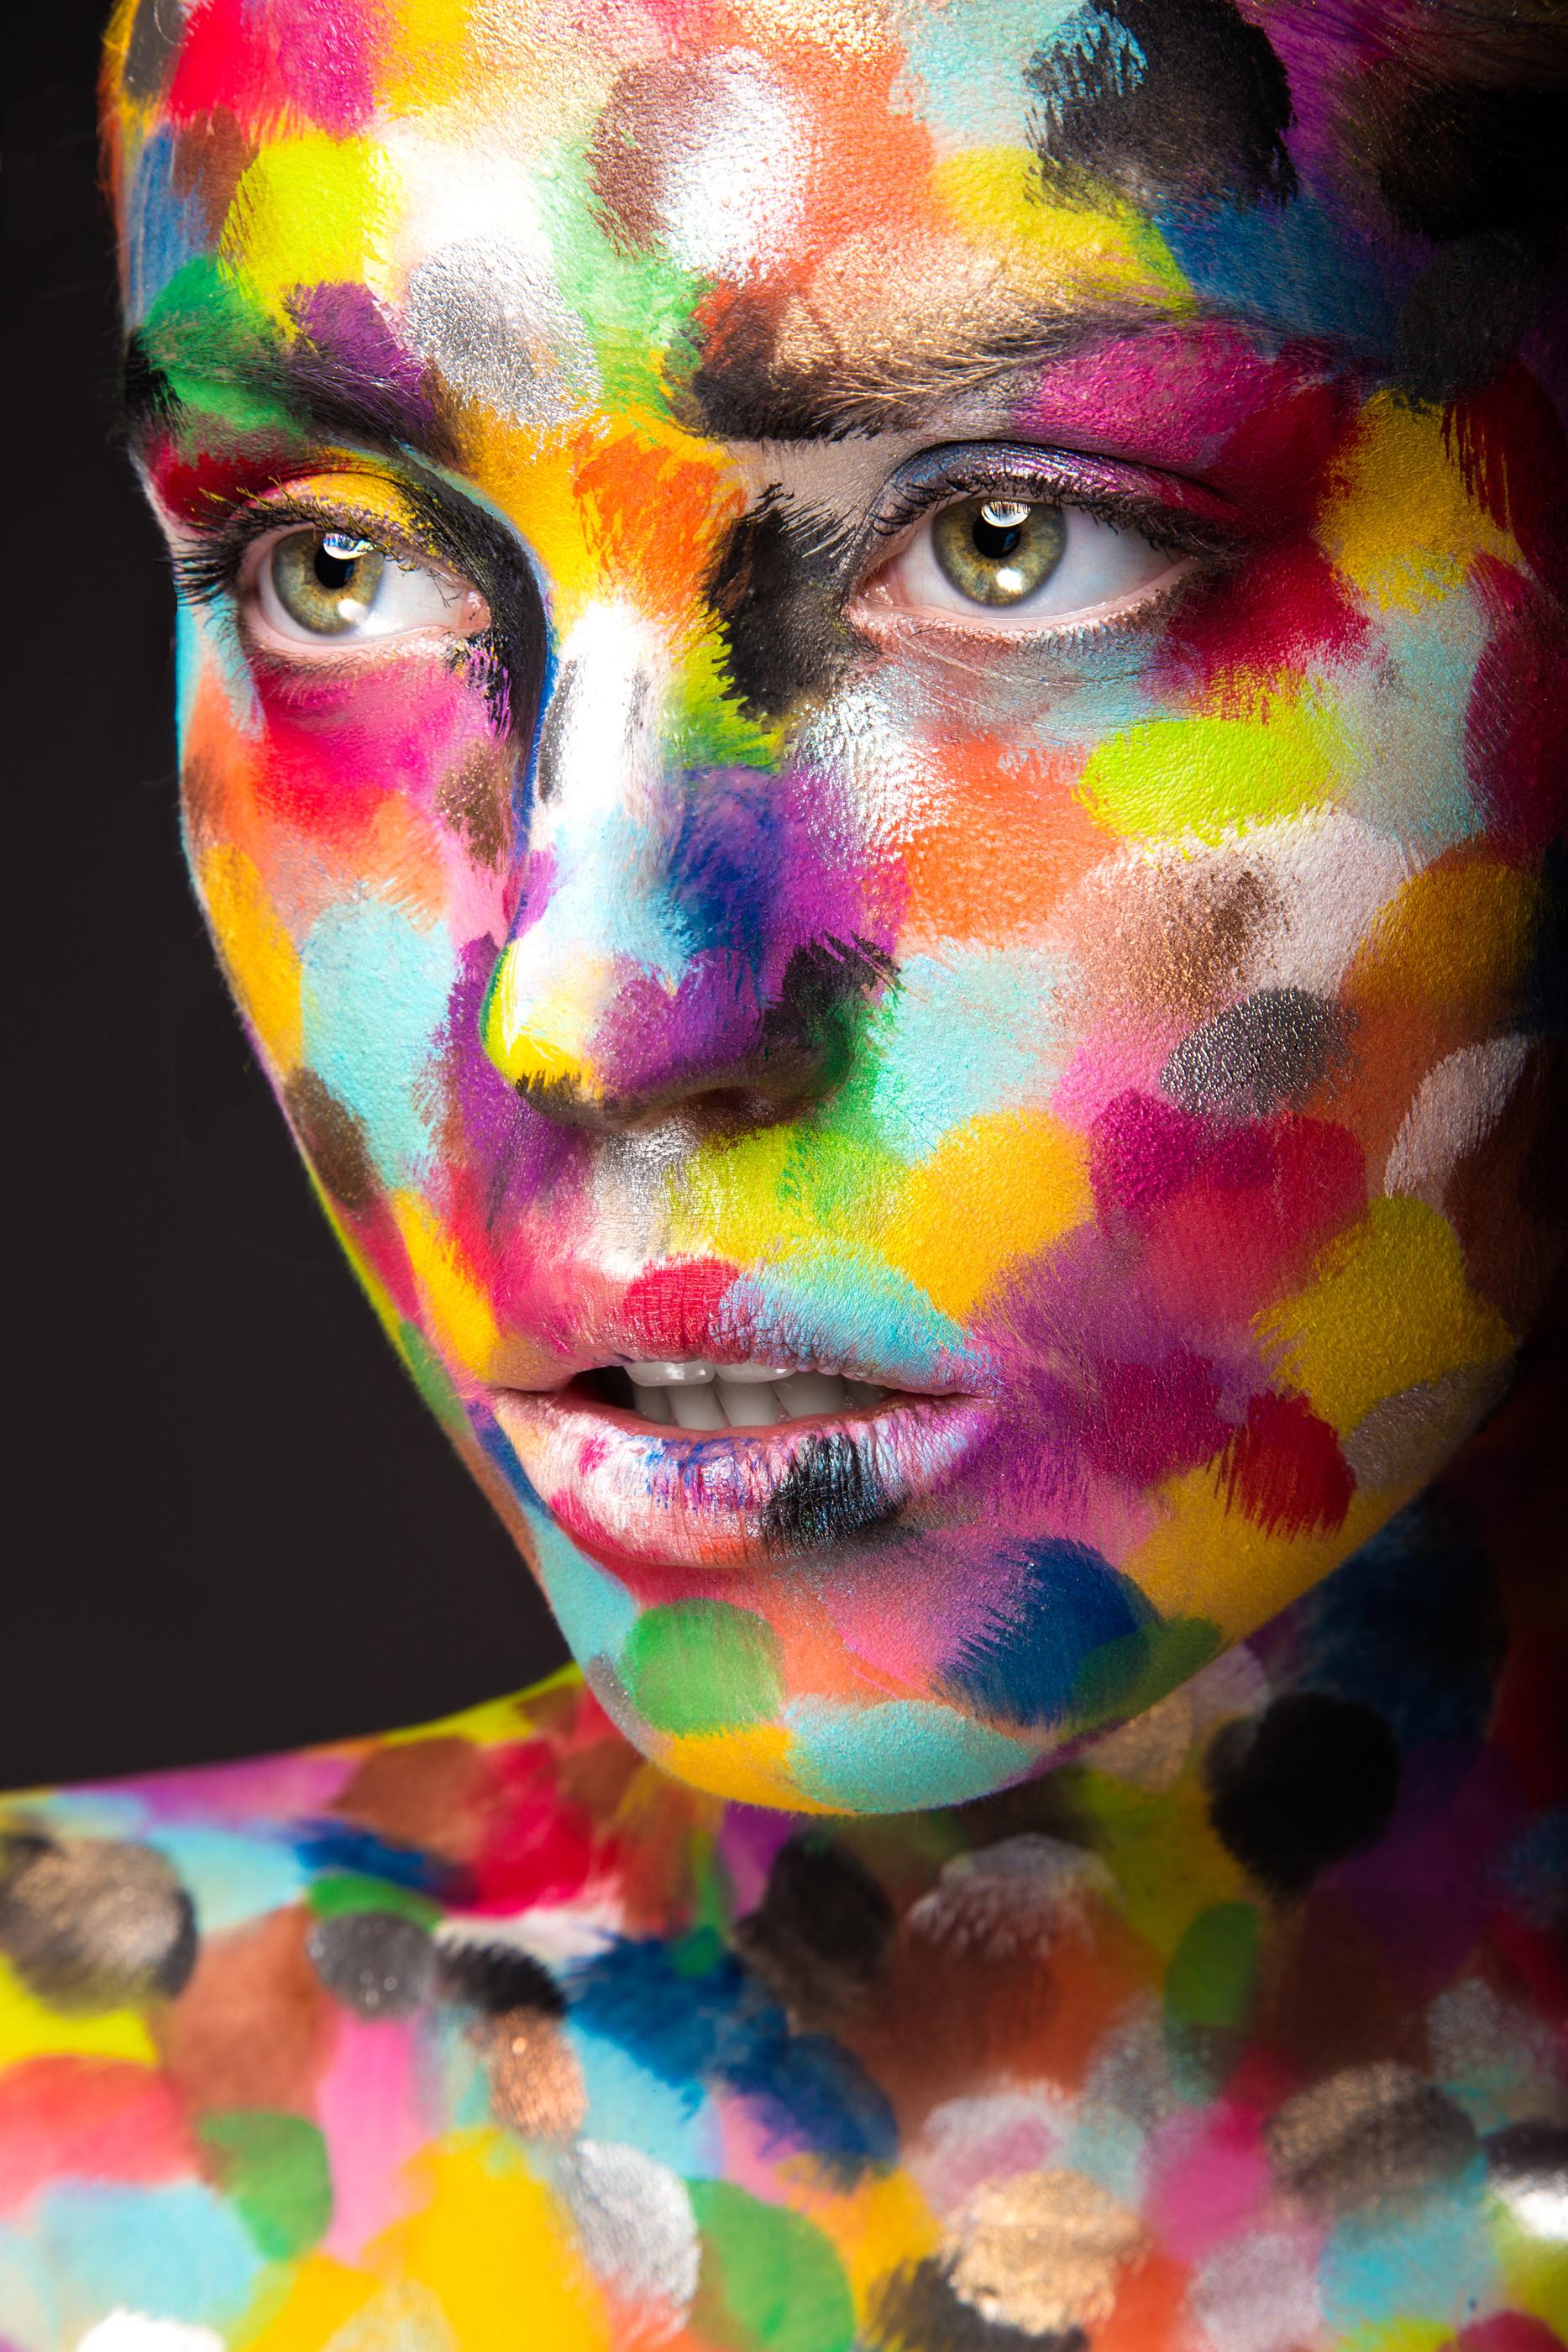 8 Hour Full Body Paint Portraits